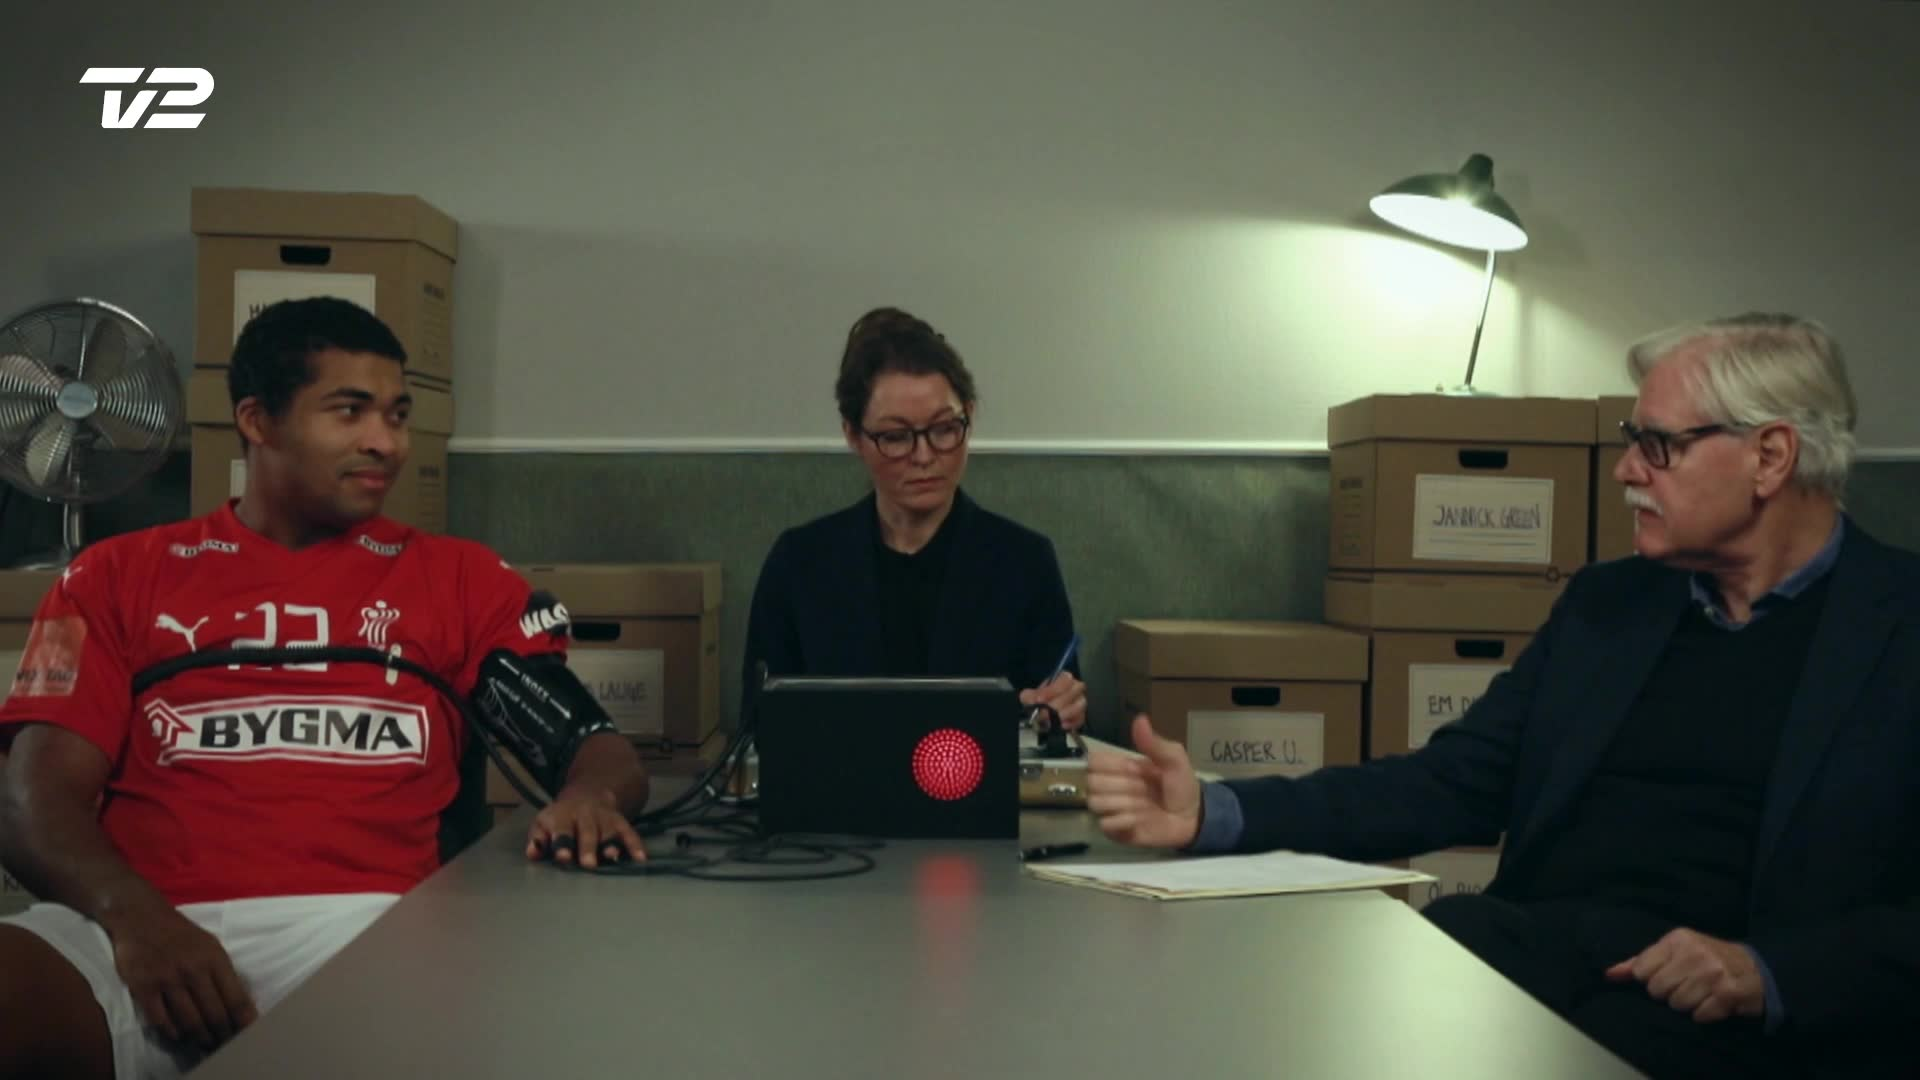 Løgnedetektor - TV 2 Sport